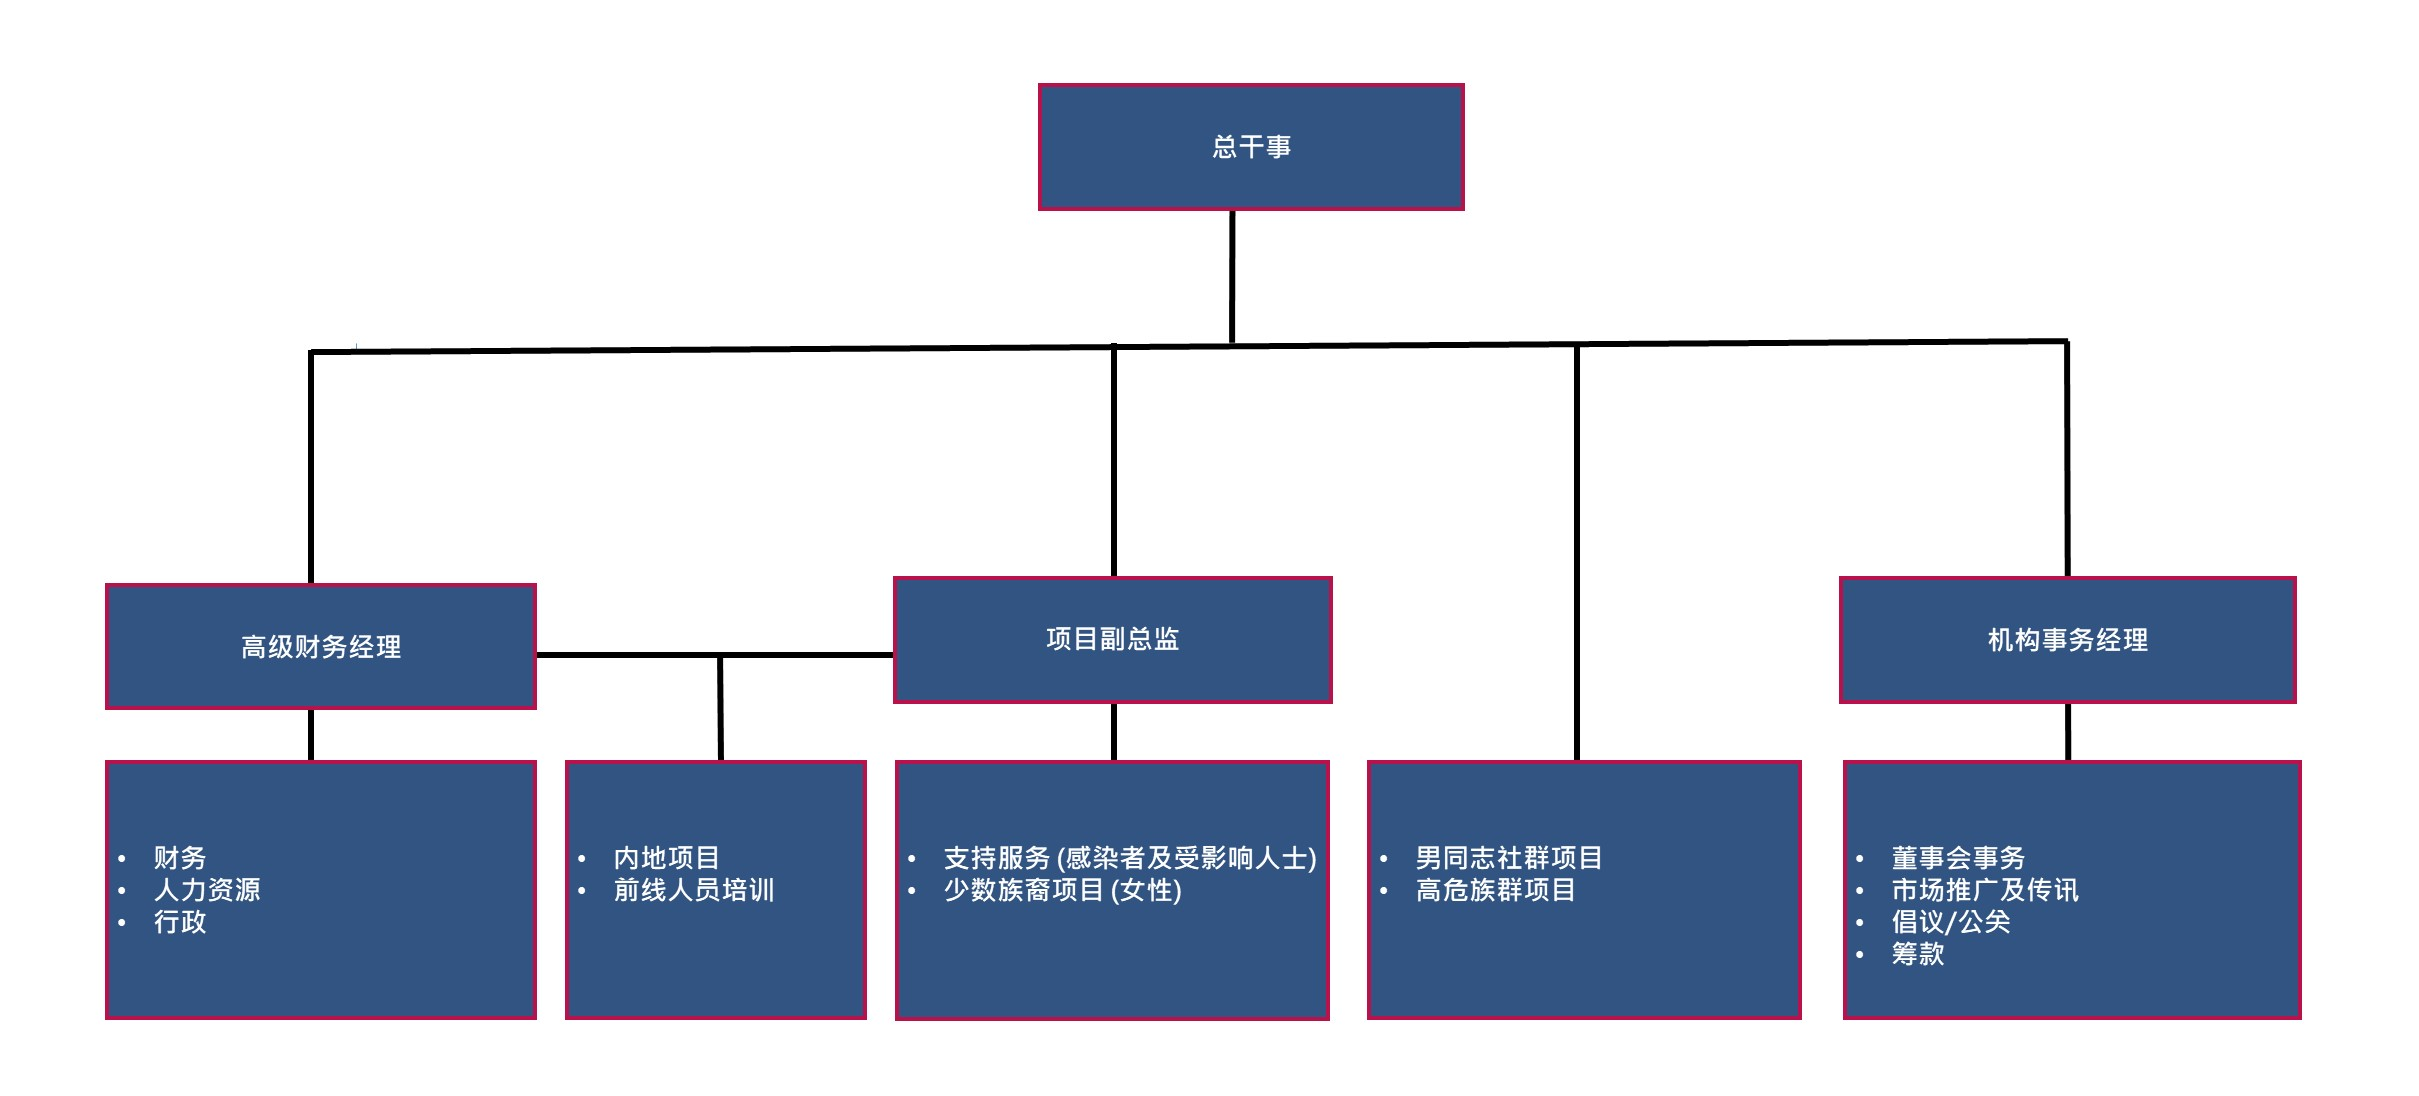 HKAF Organization Chart 20200121_SC